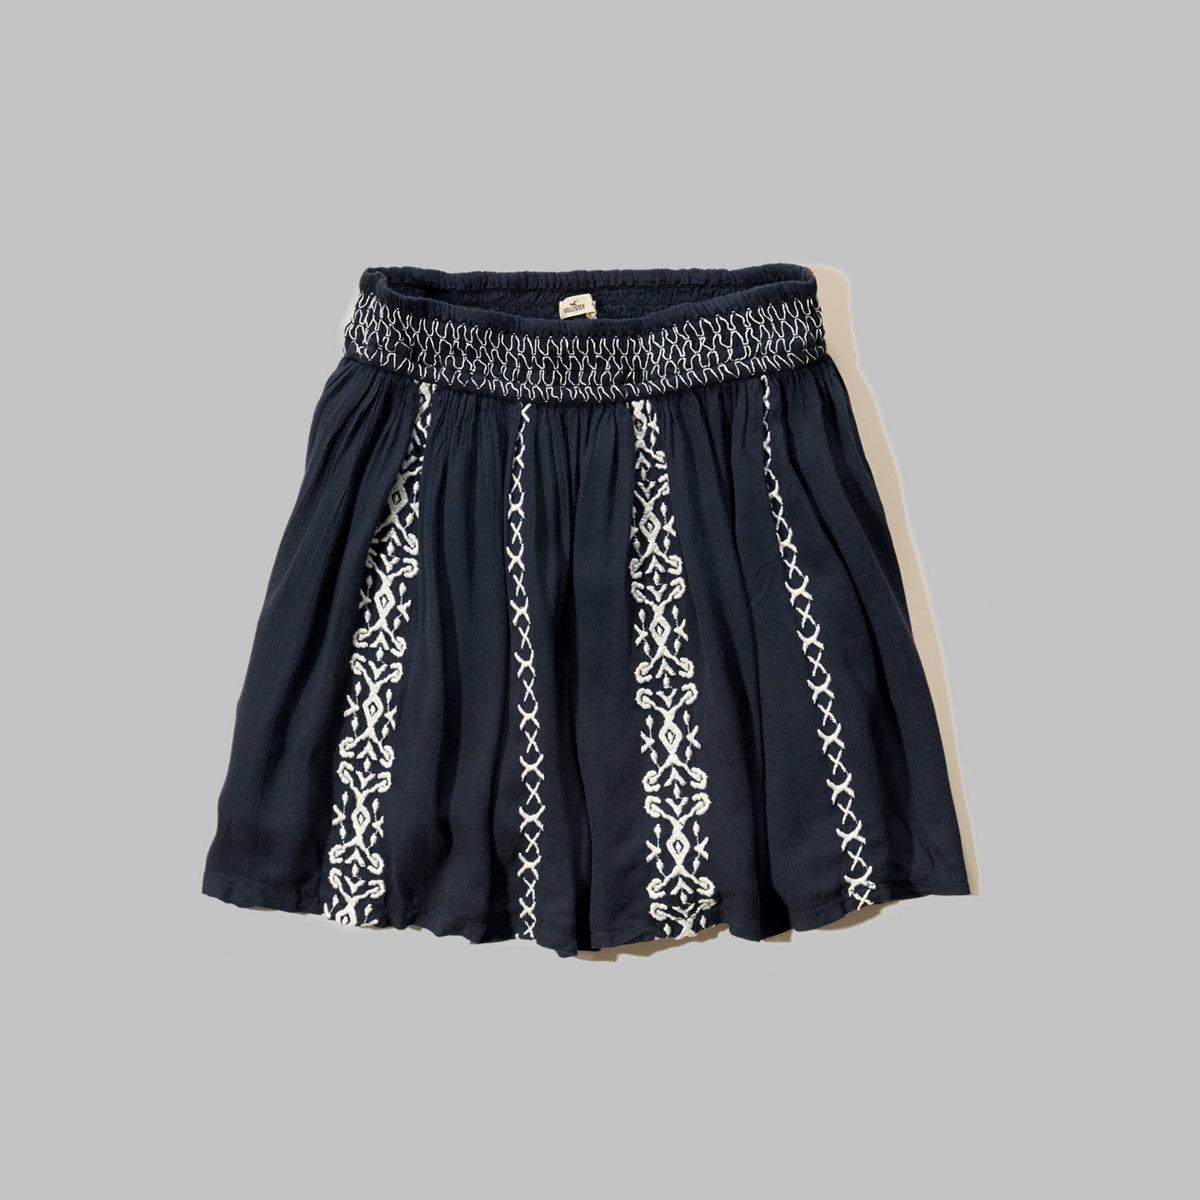 Embroidered Smocked-Waist Skirt